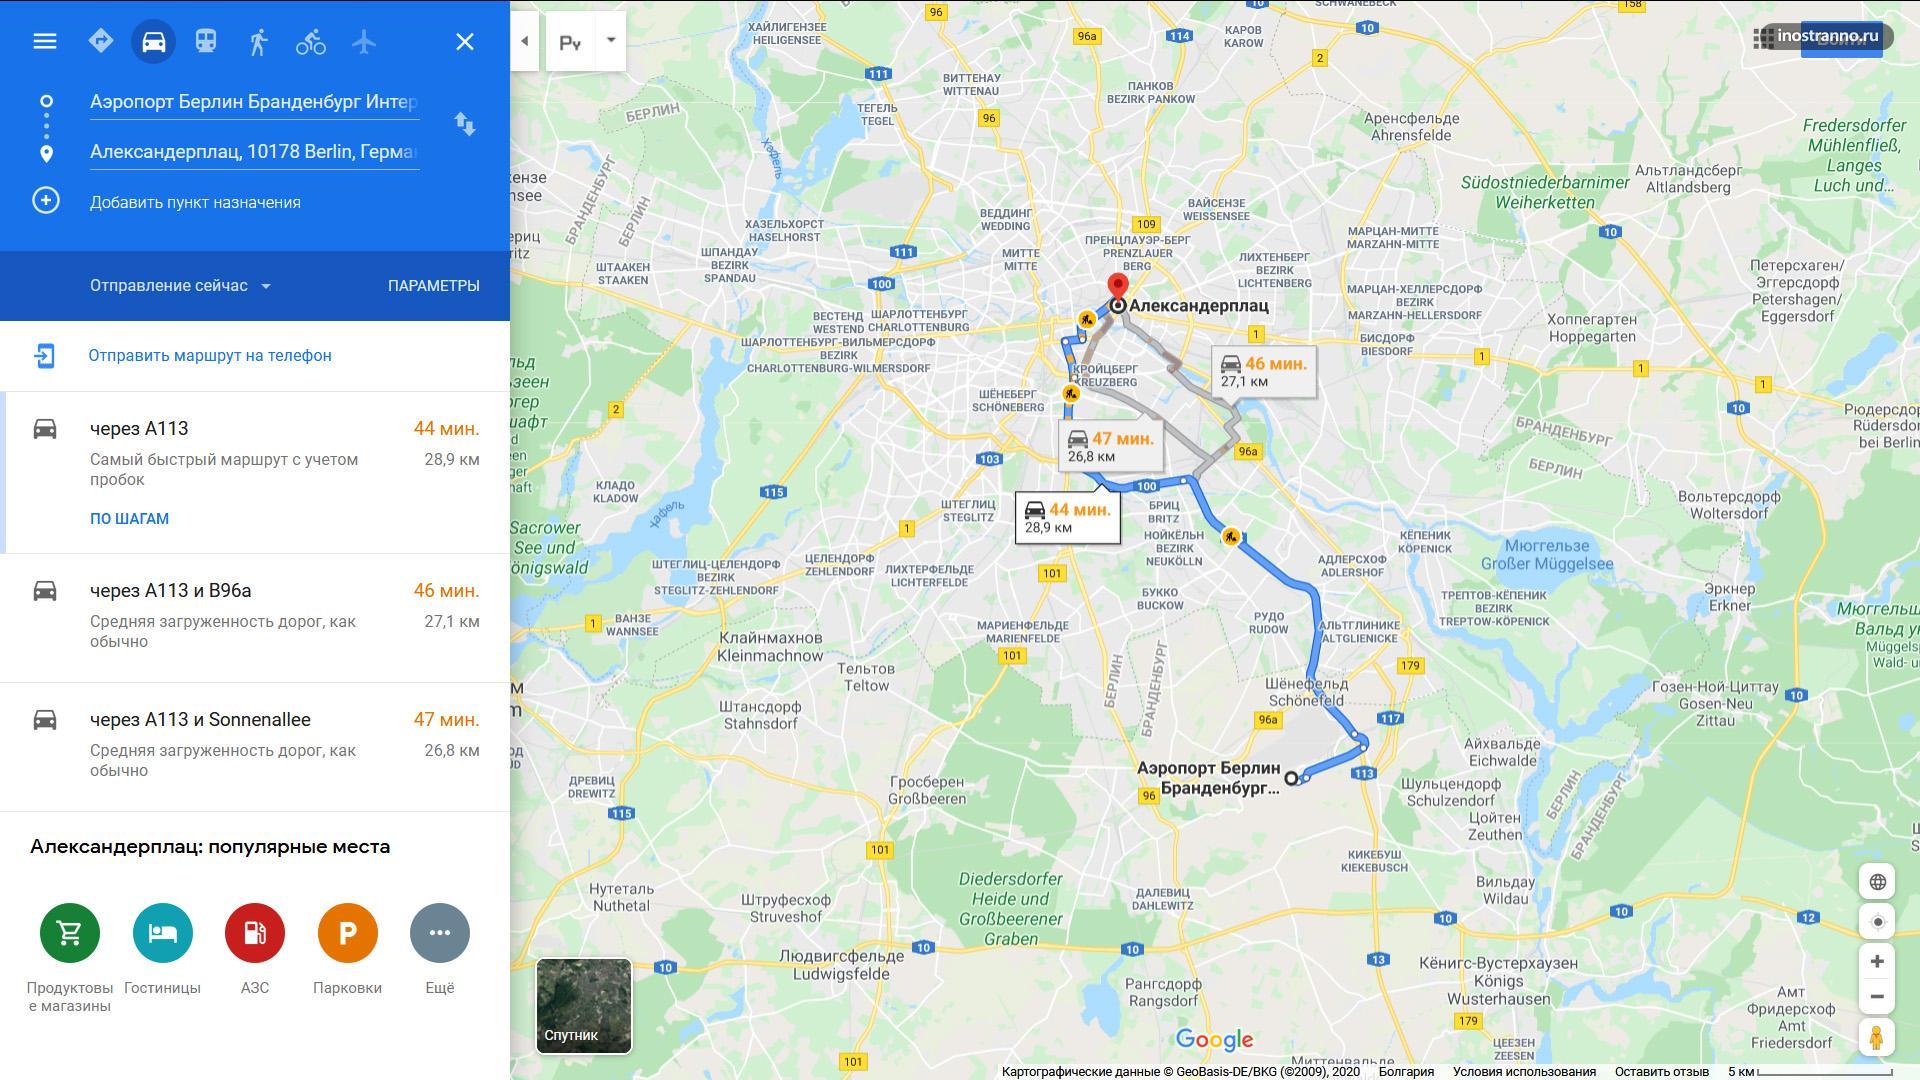 Новый аэропорт Берлин-Бранденбург на карте